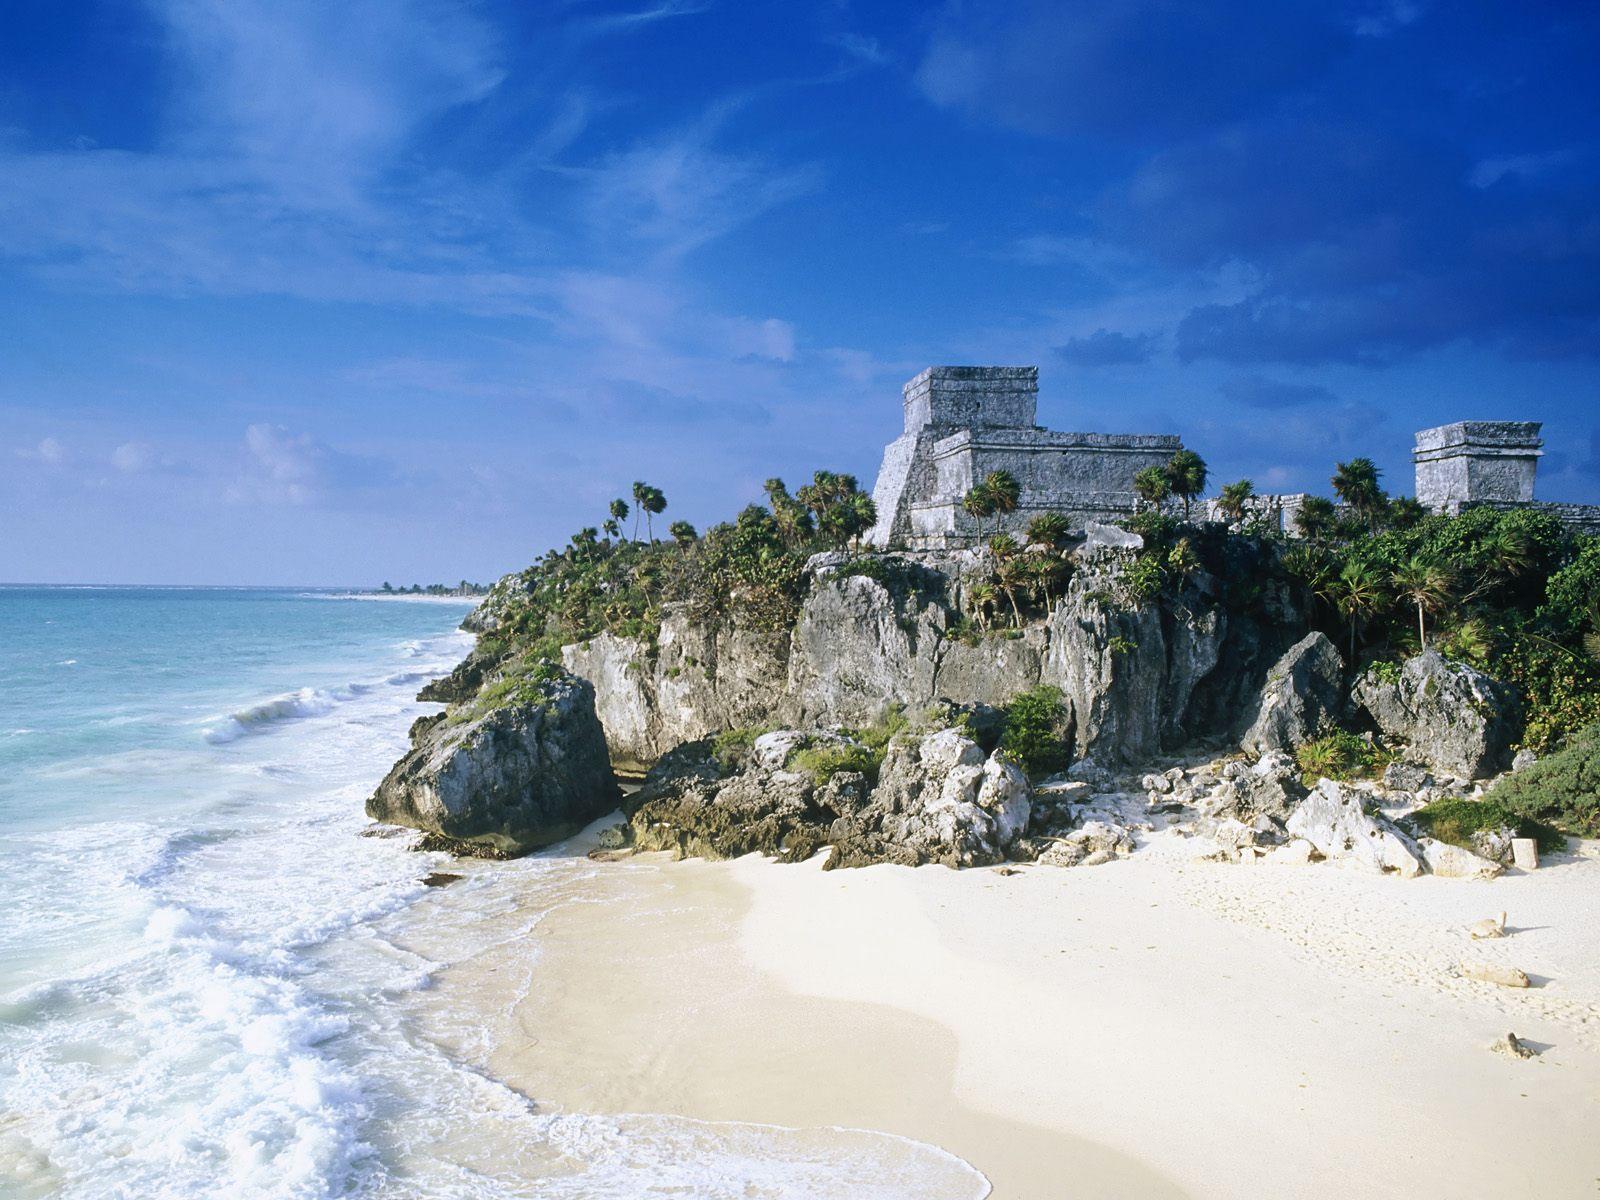 Tulum Beach Mexico Desktop Wallpaper 1600x1200